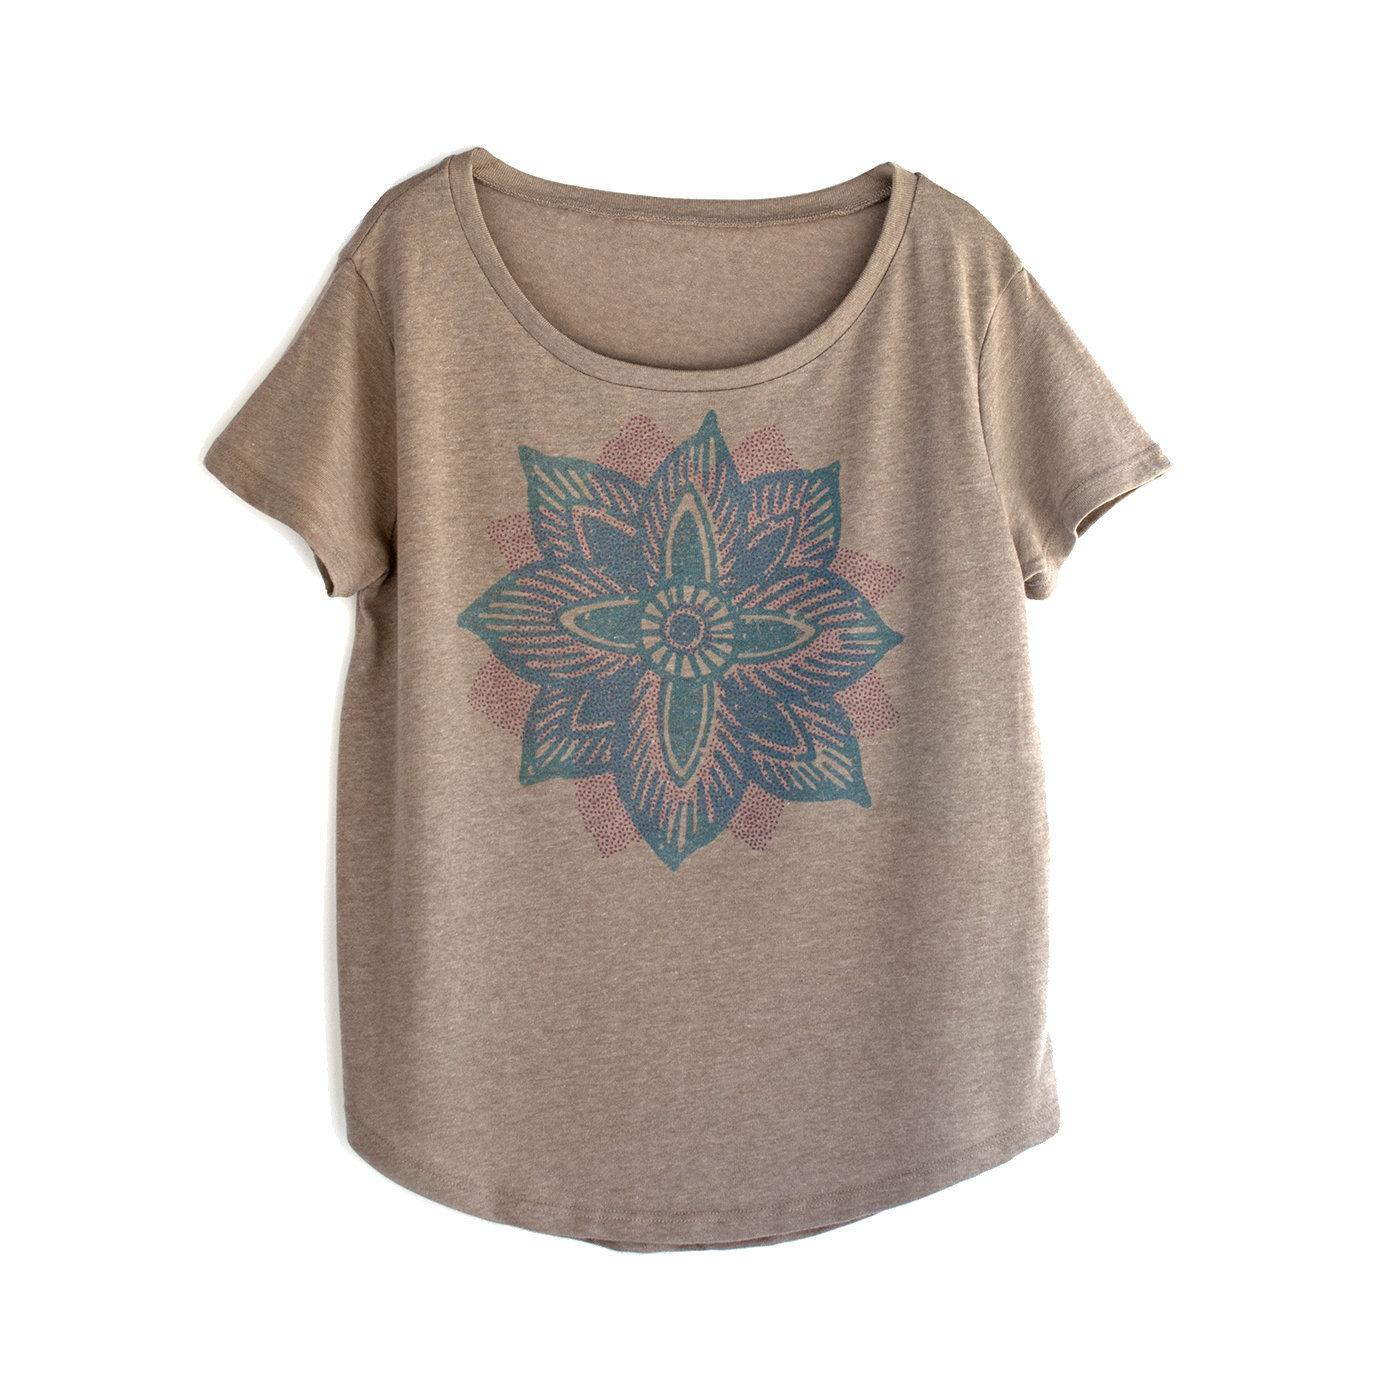 Lotus Tee Yoga Shirt Lotus Flower Print Hand Printed Top Etsy